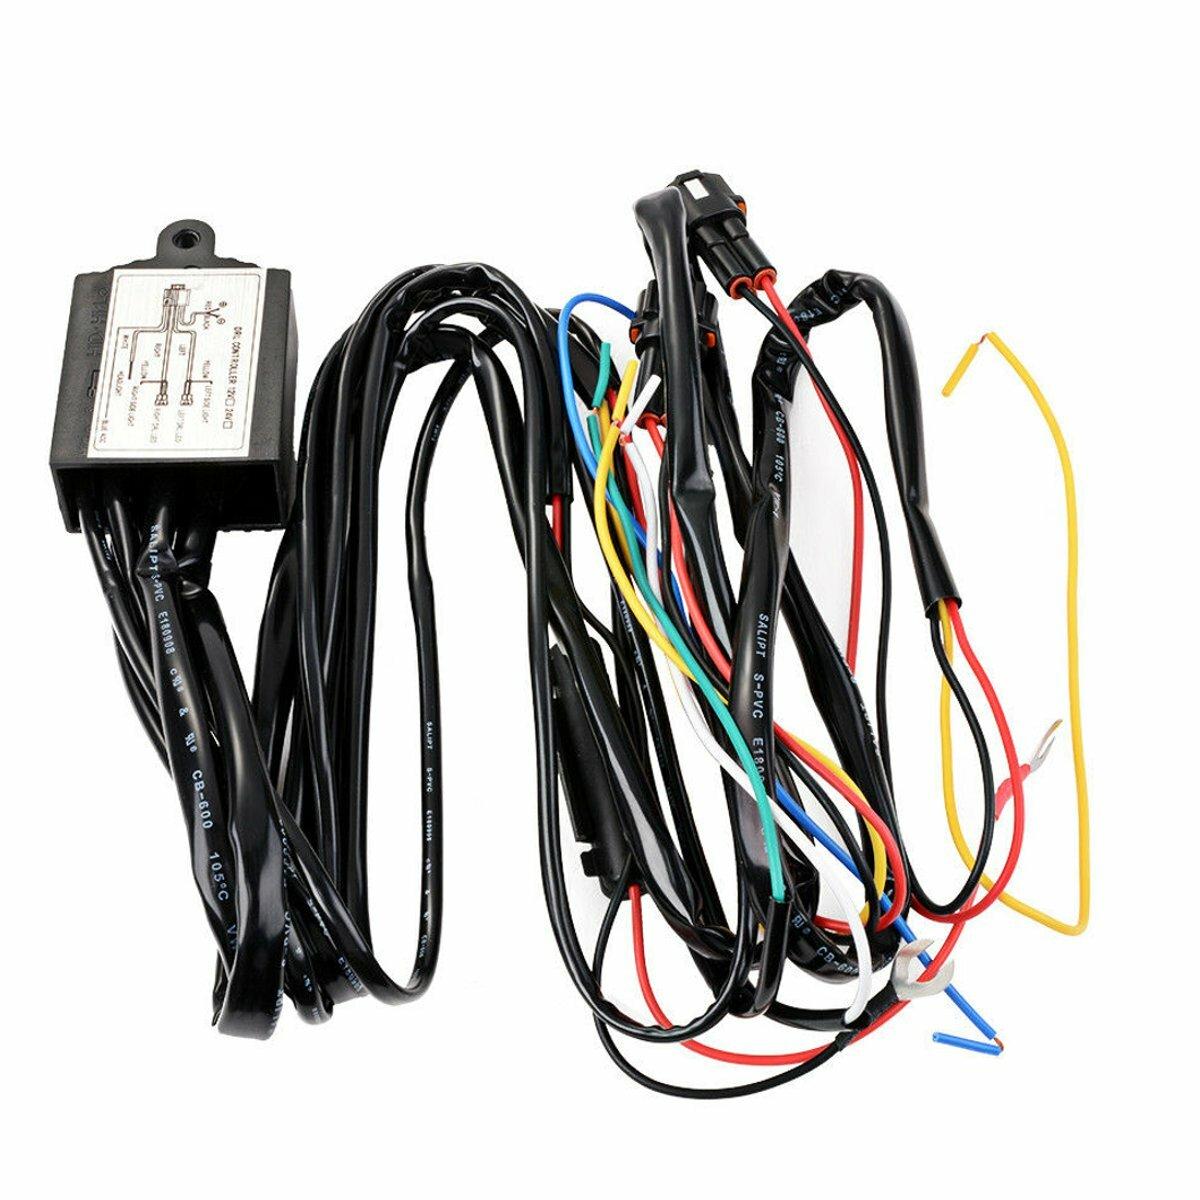 12V DRL Dimmer LED עמעום ממסר יום ריצה אור רכב על מתג הפעלה / כיבוי עם Flash הפעל אותות עיכוב פונקציה